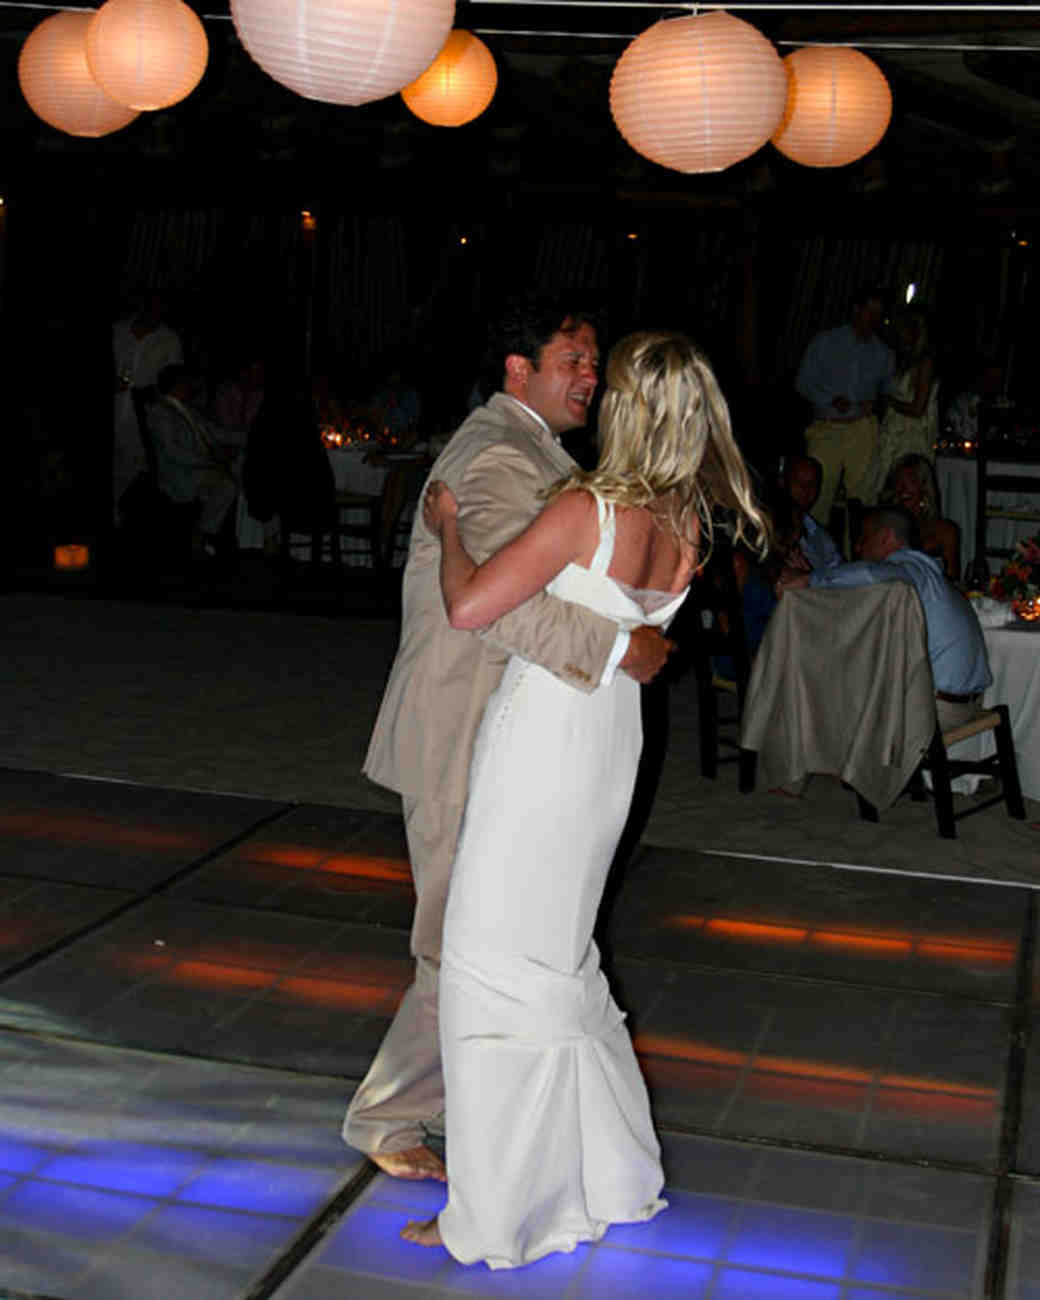 rw_2010_nina_john_dance.jpg